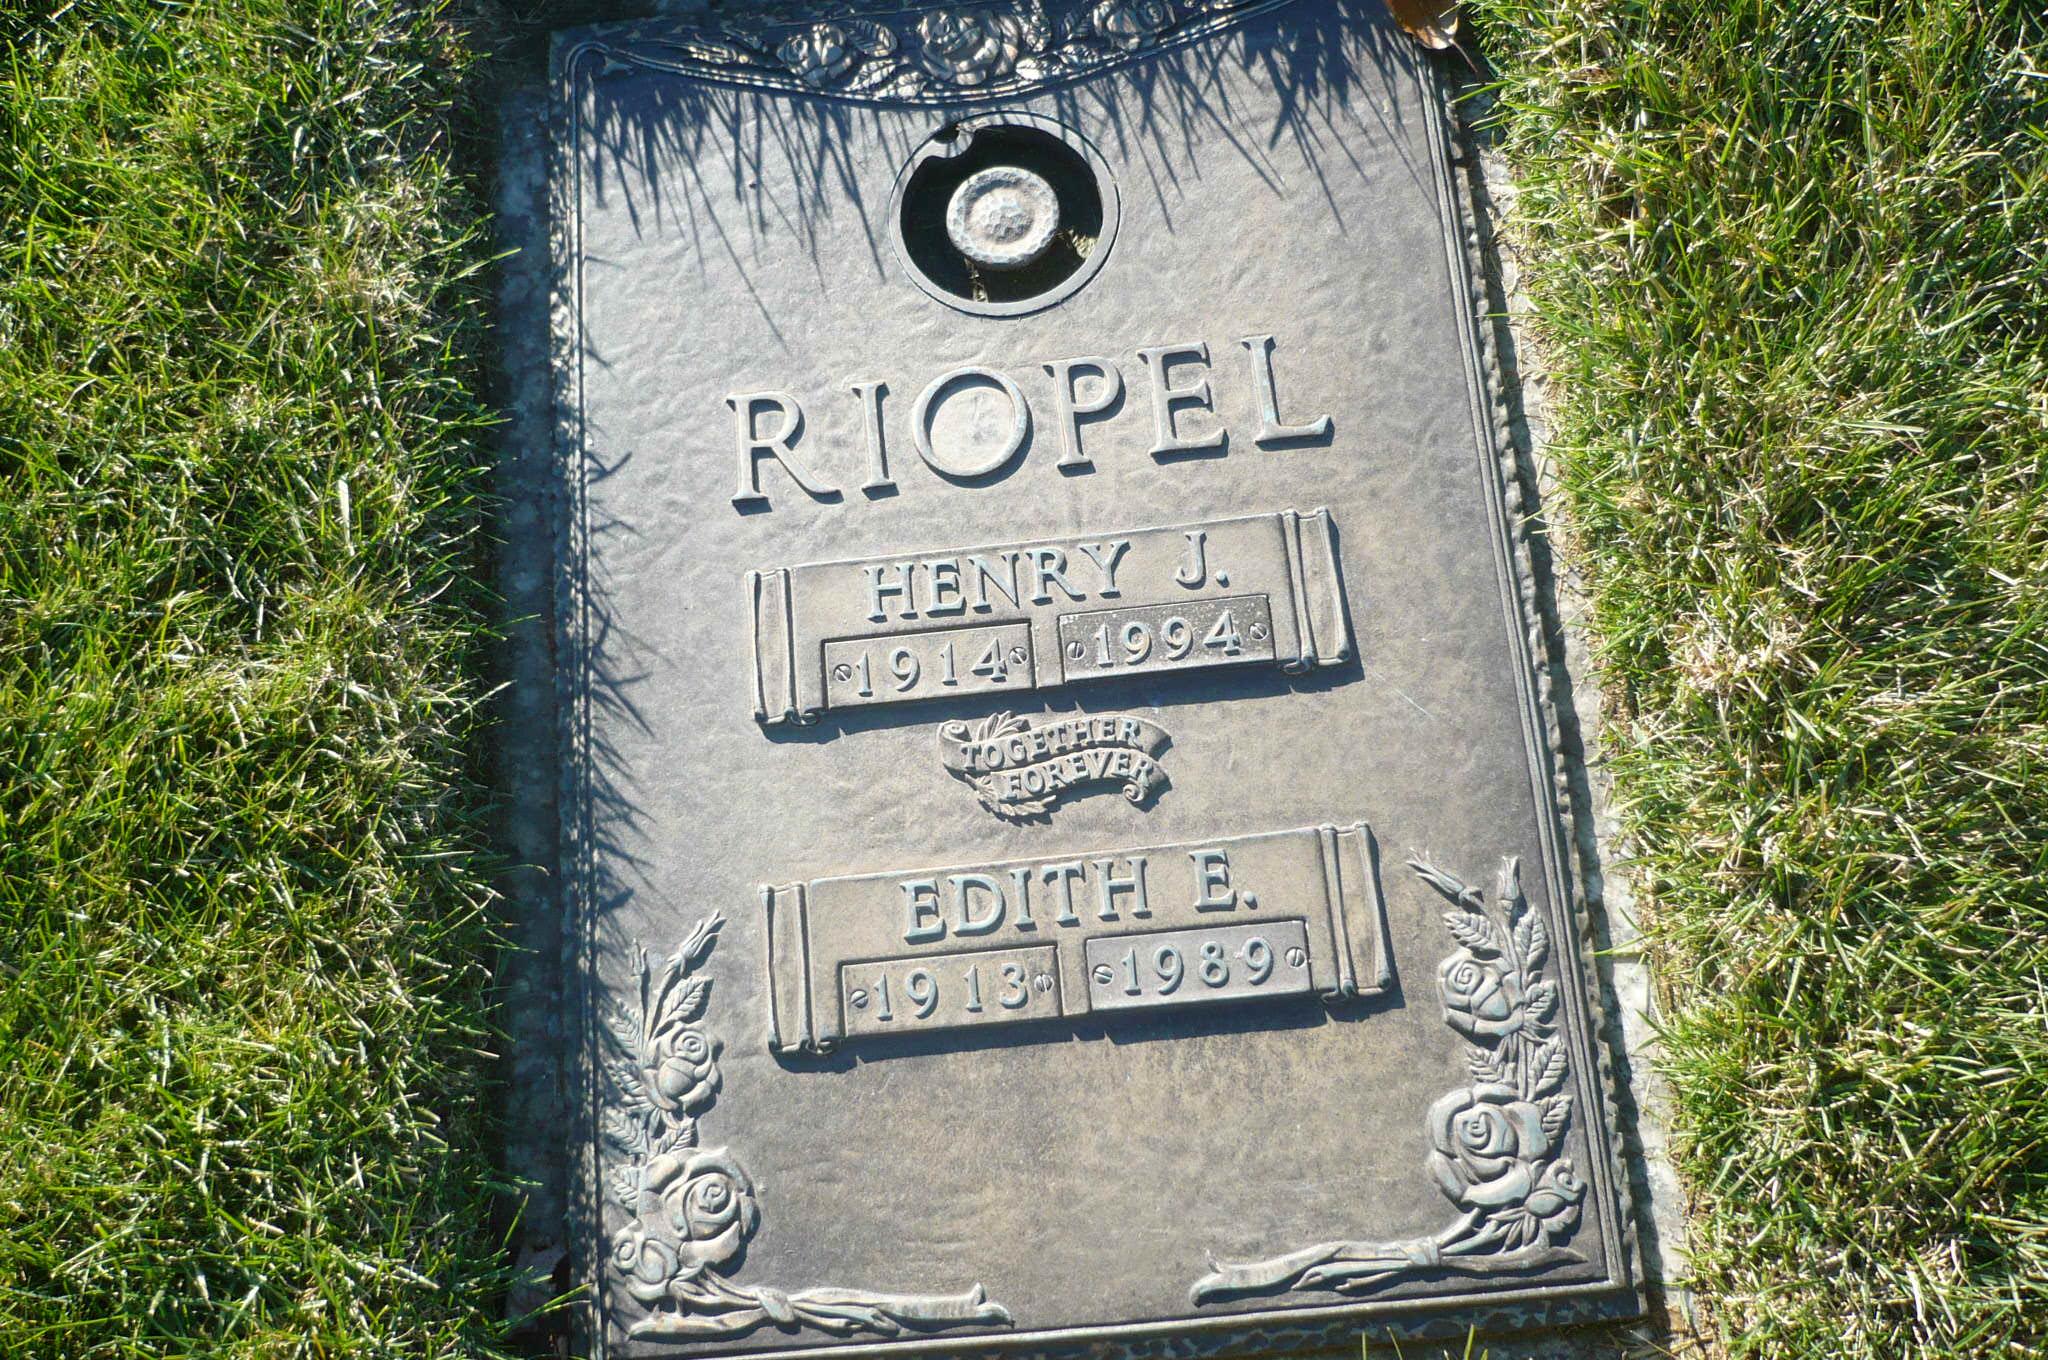 Edith E Riopel